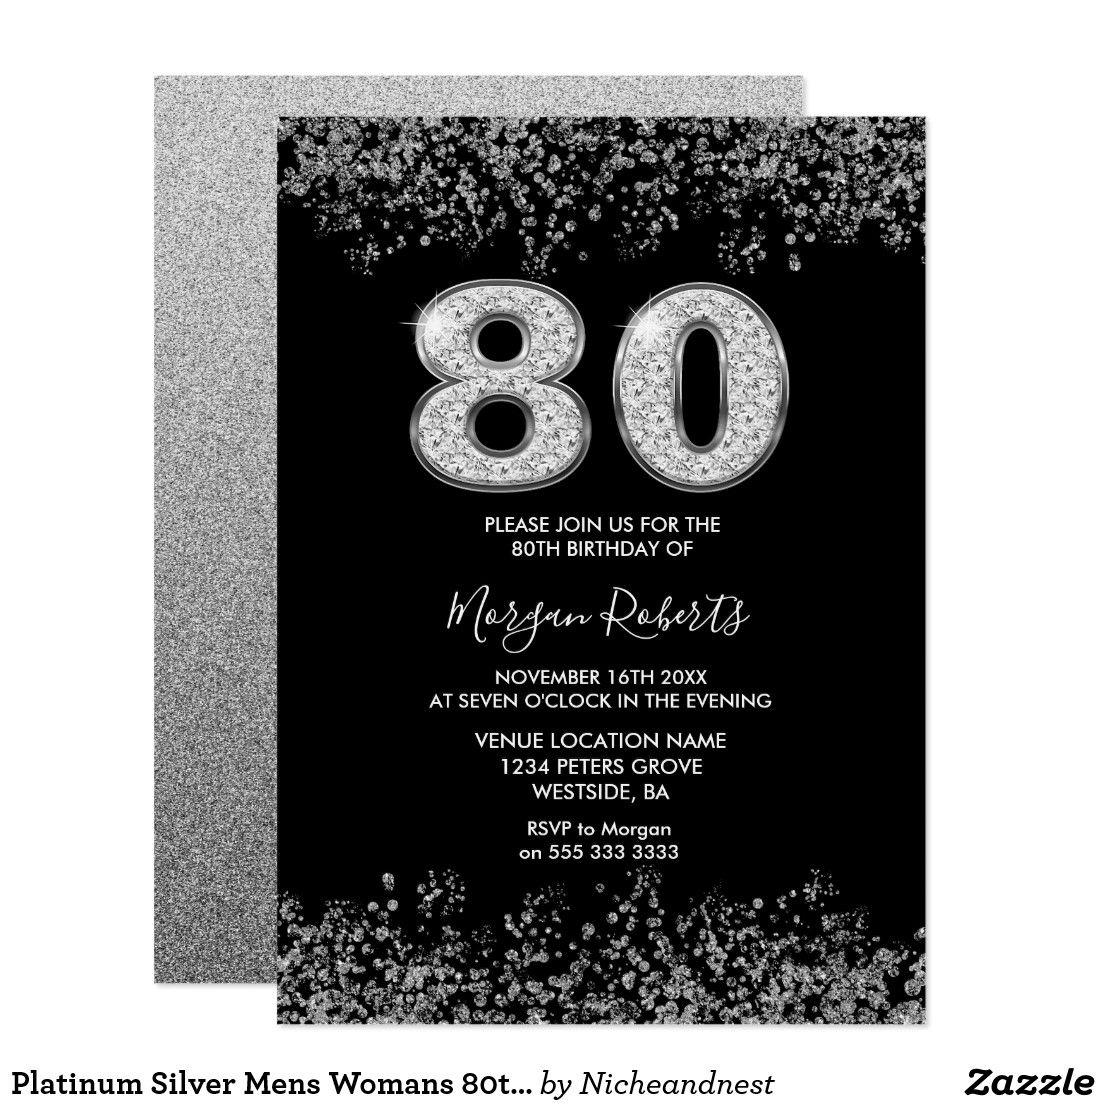 Platinum Silver Mens Womans 80th Birthday Party Invitation